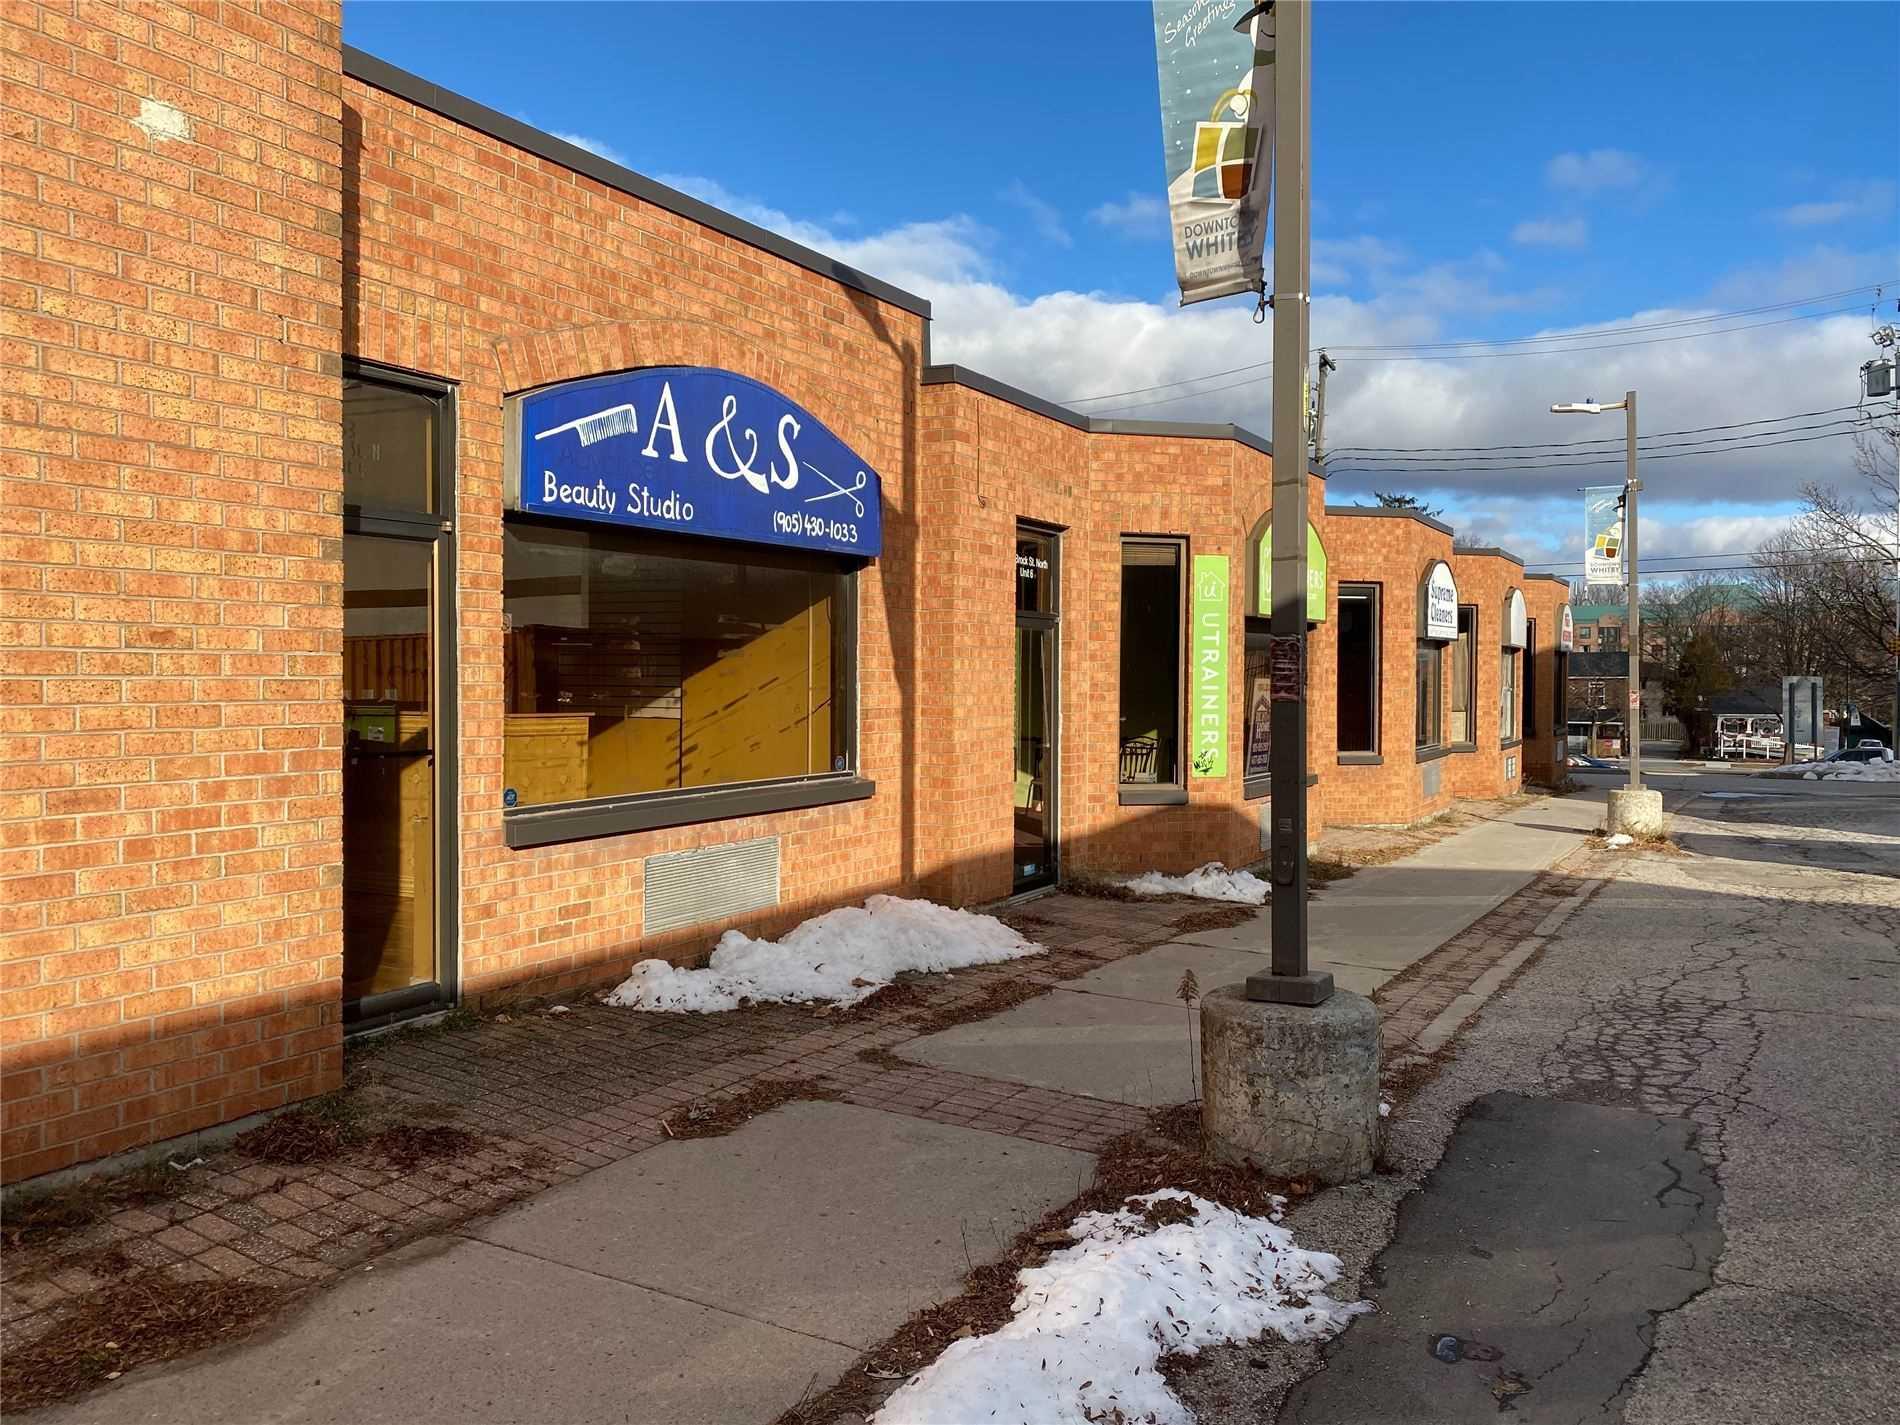 153 Brock St N, Whitby Ontario, Canada